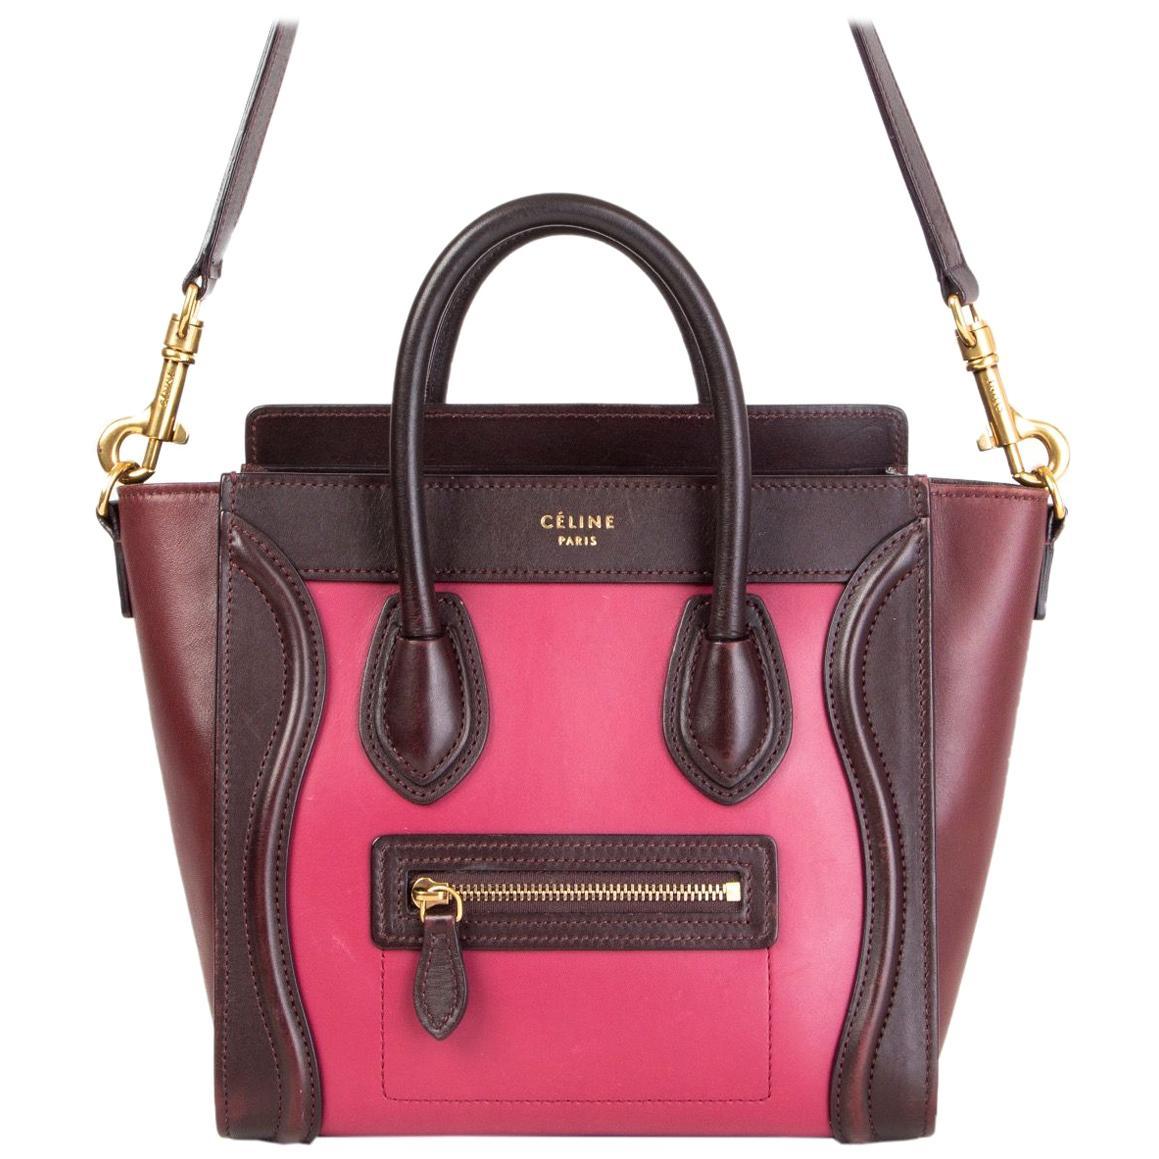 CELINE pink burgundy & maroon leather TRI-COLORED NANO LUGGAGE Tote Shoulder Bag